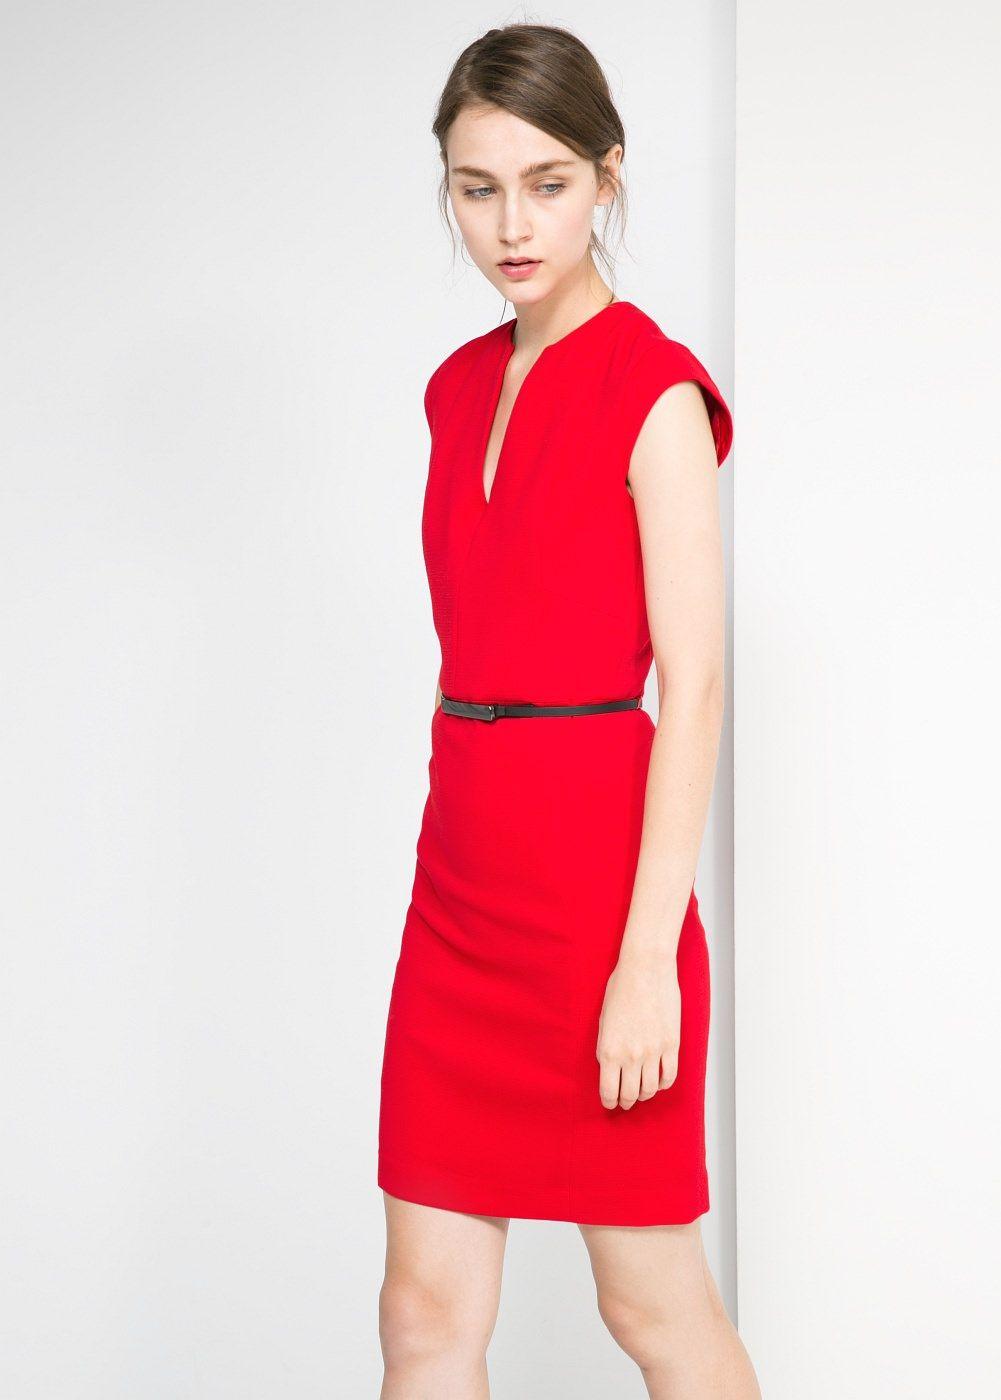 Vestido Cinto Fino Mulher Fashion Fashion Dresses